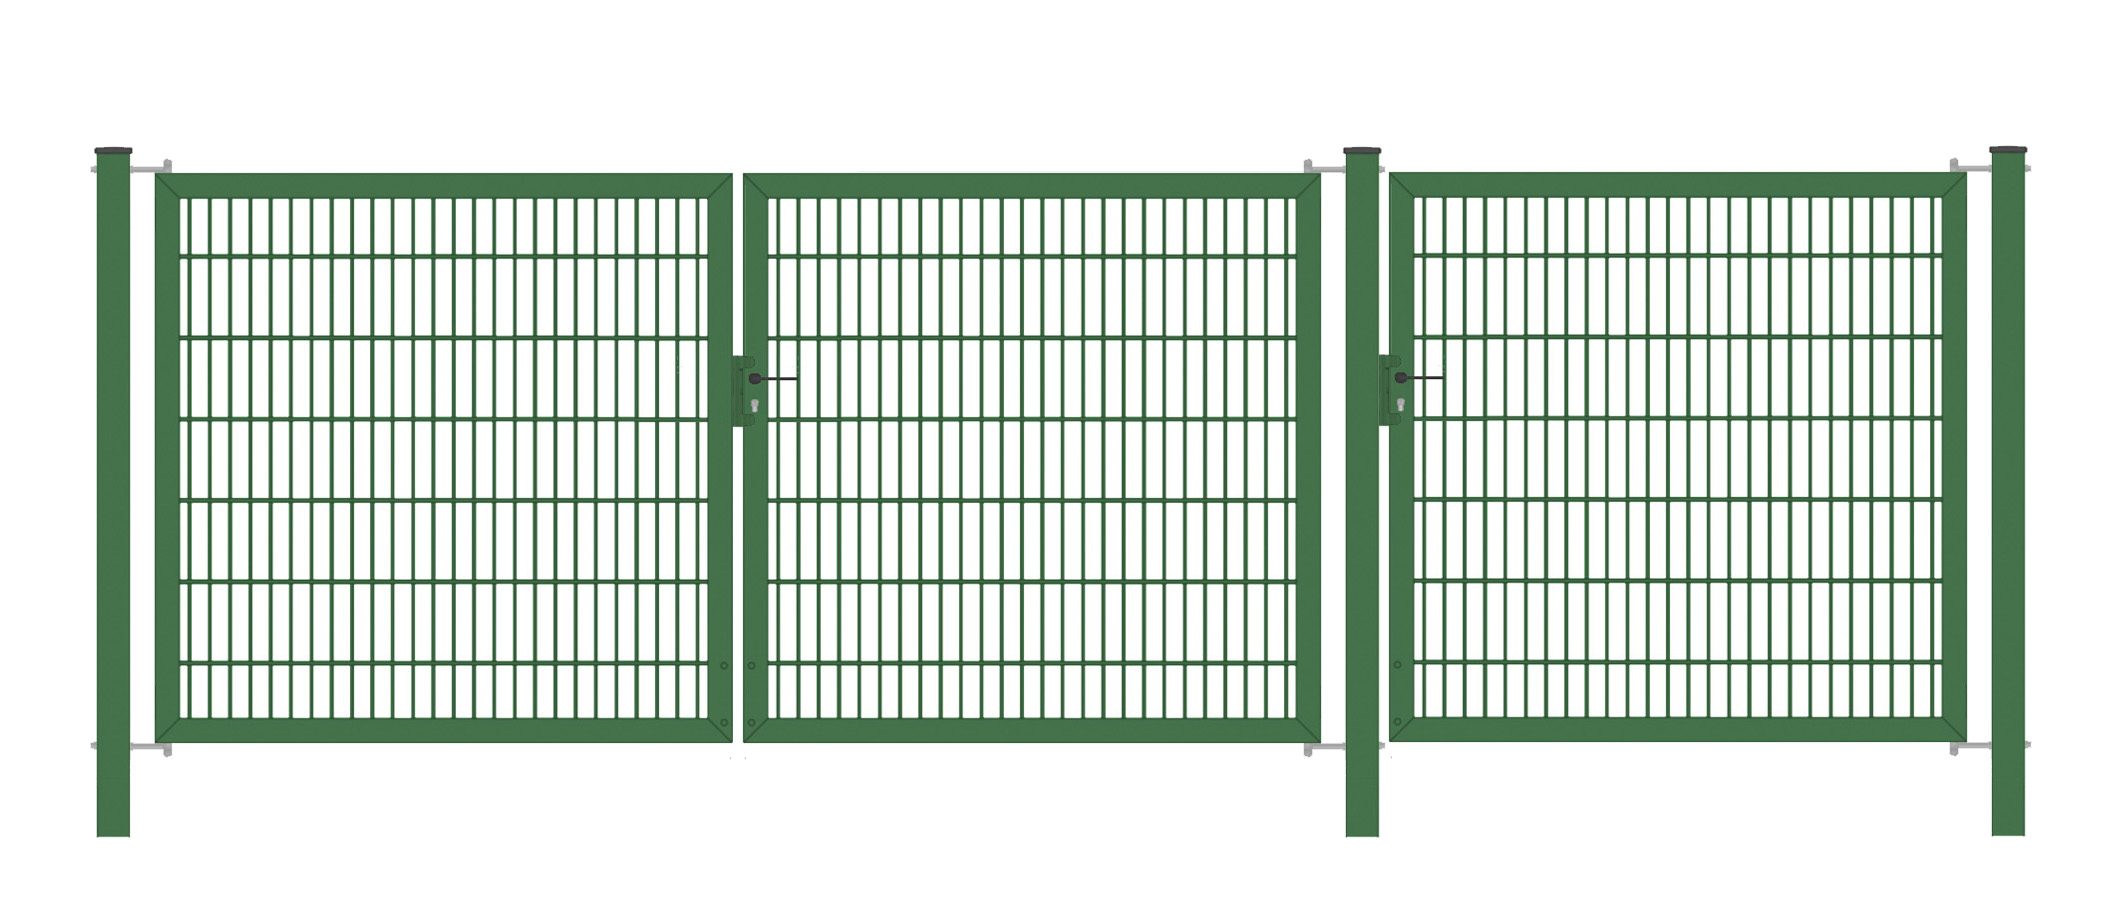 Einfahrtstor / Gartentor 22221 flügelig Classic Strong symmetrisch 2221 2221 2221;  Grün 21/21/21 mm Doppelstabmatte; Breite 222221 cm Höhe 22221 cm